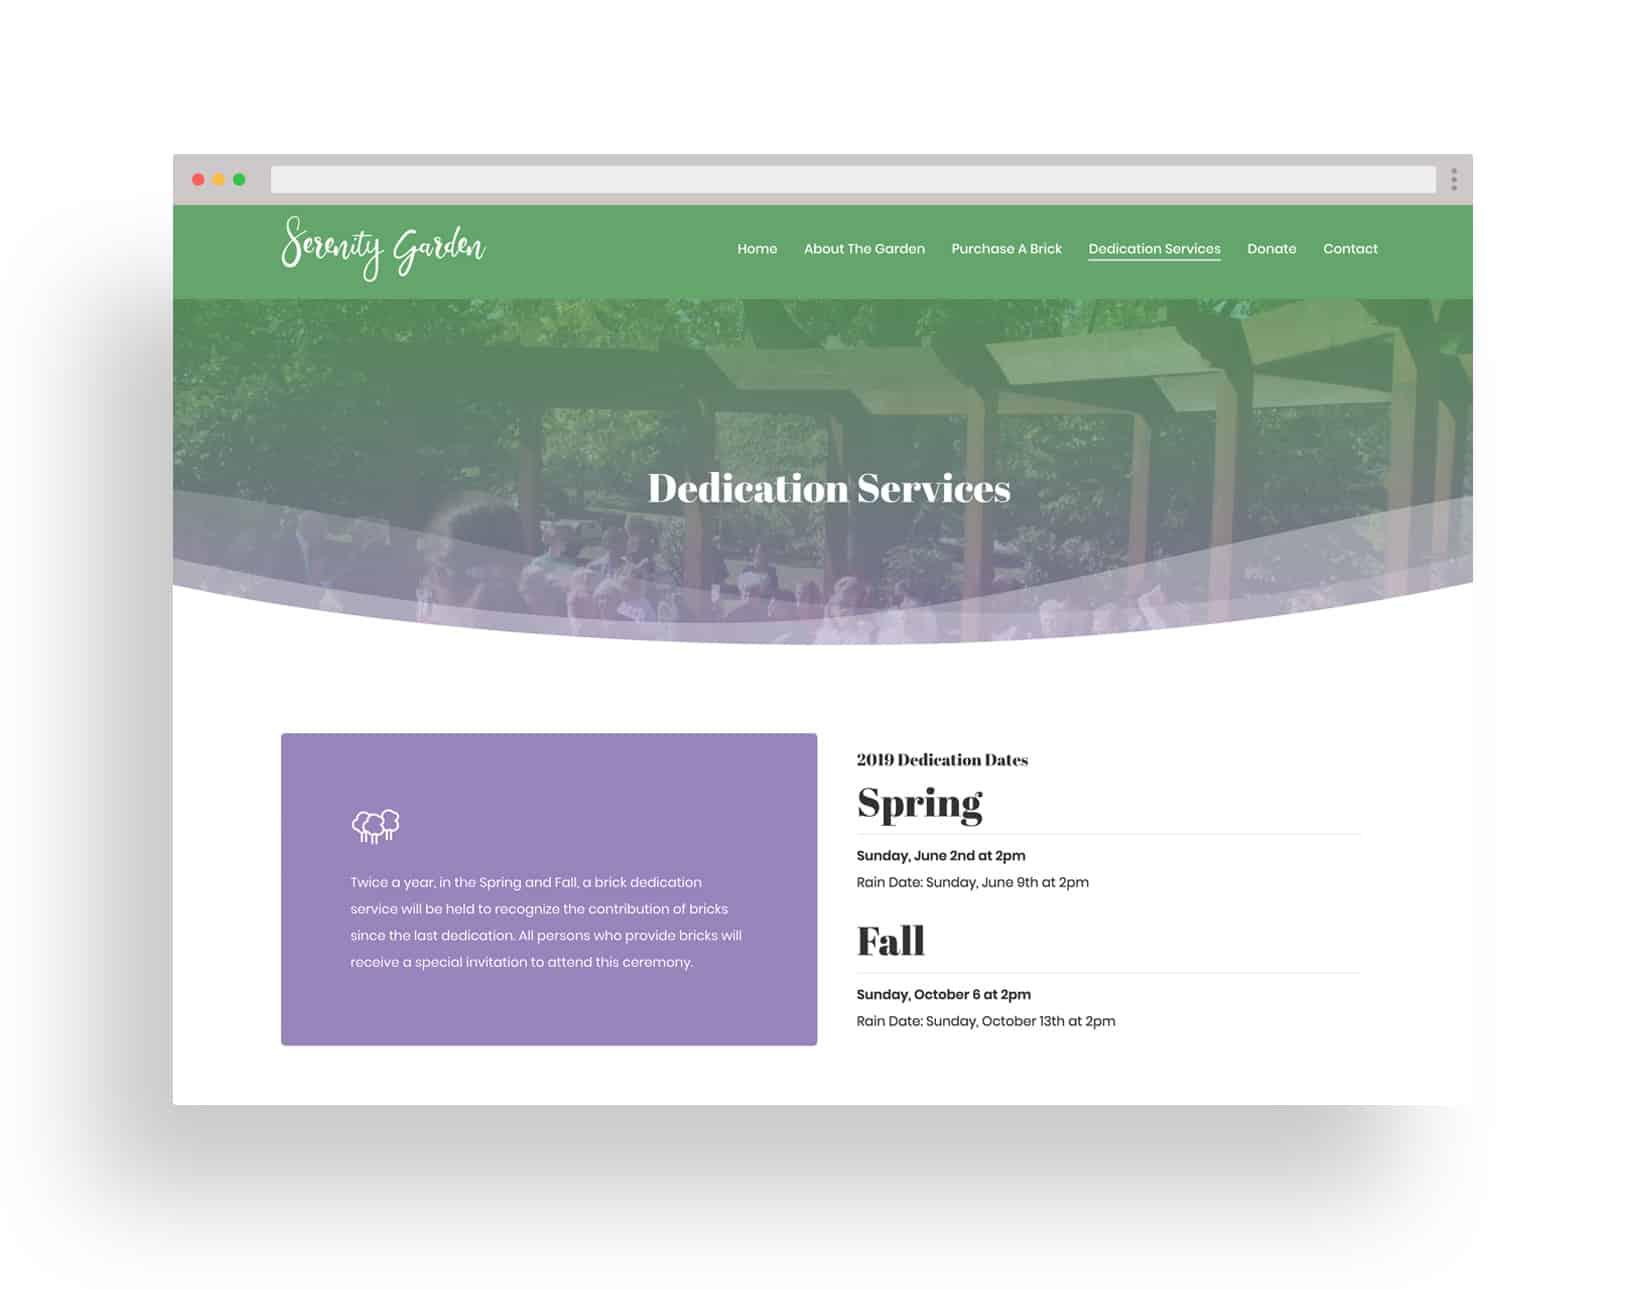 Studio JWAL Web Design Client - The Serenity Garden